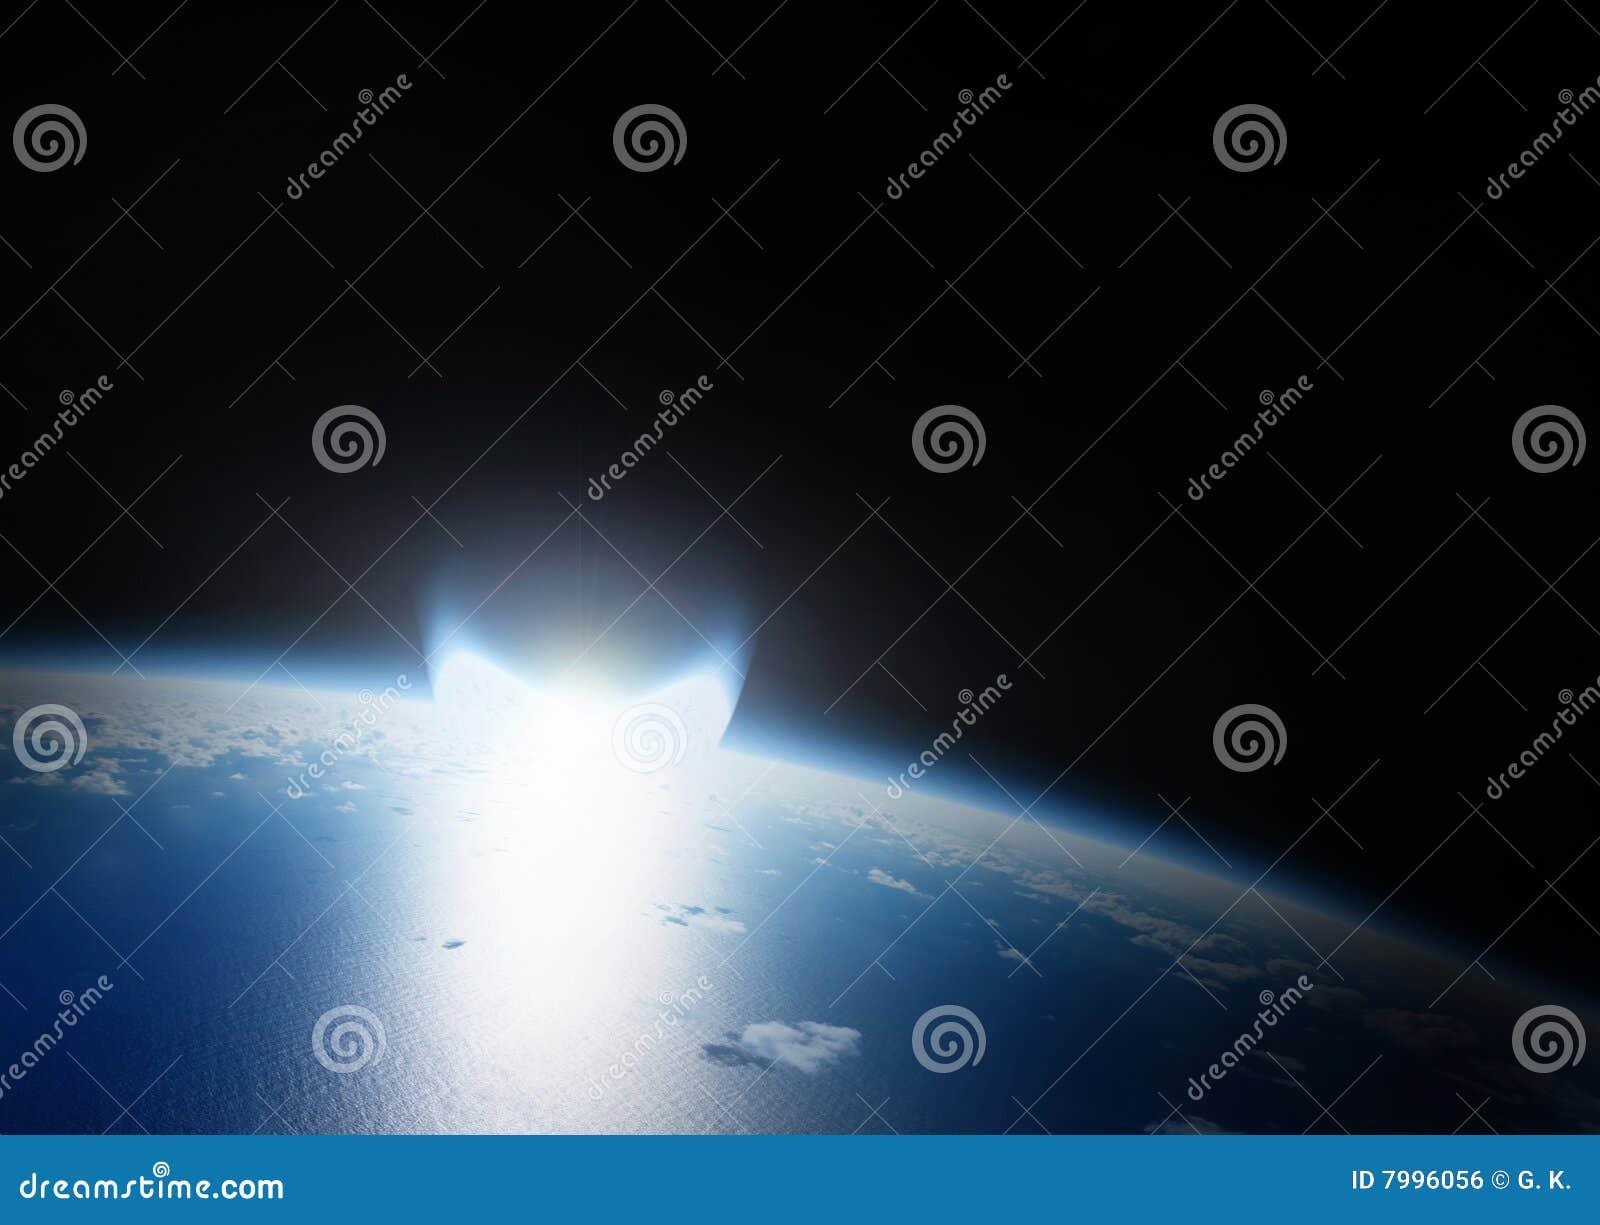 астероидный удар земли катастрофы